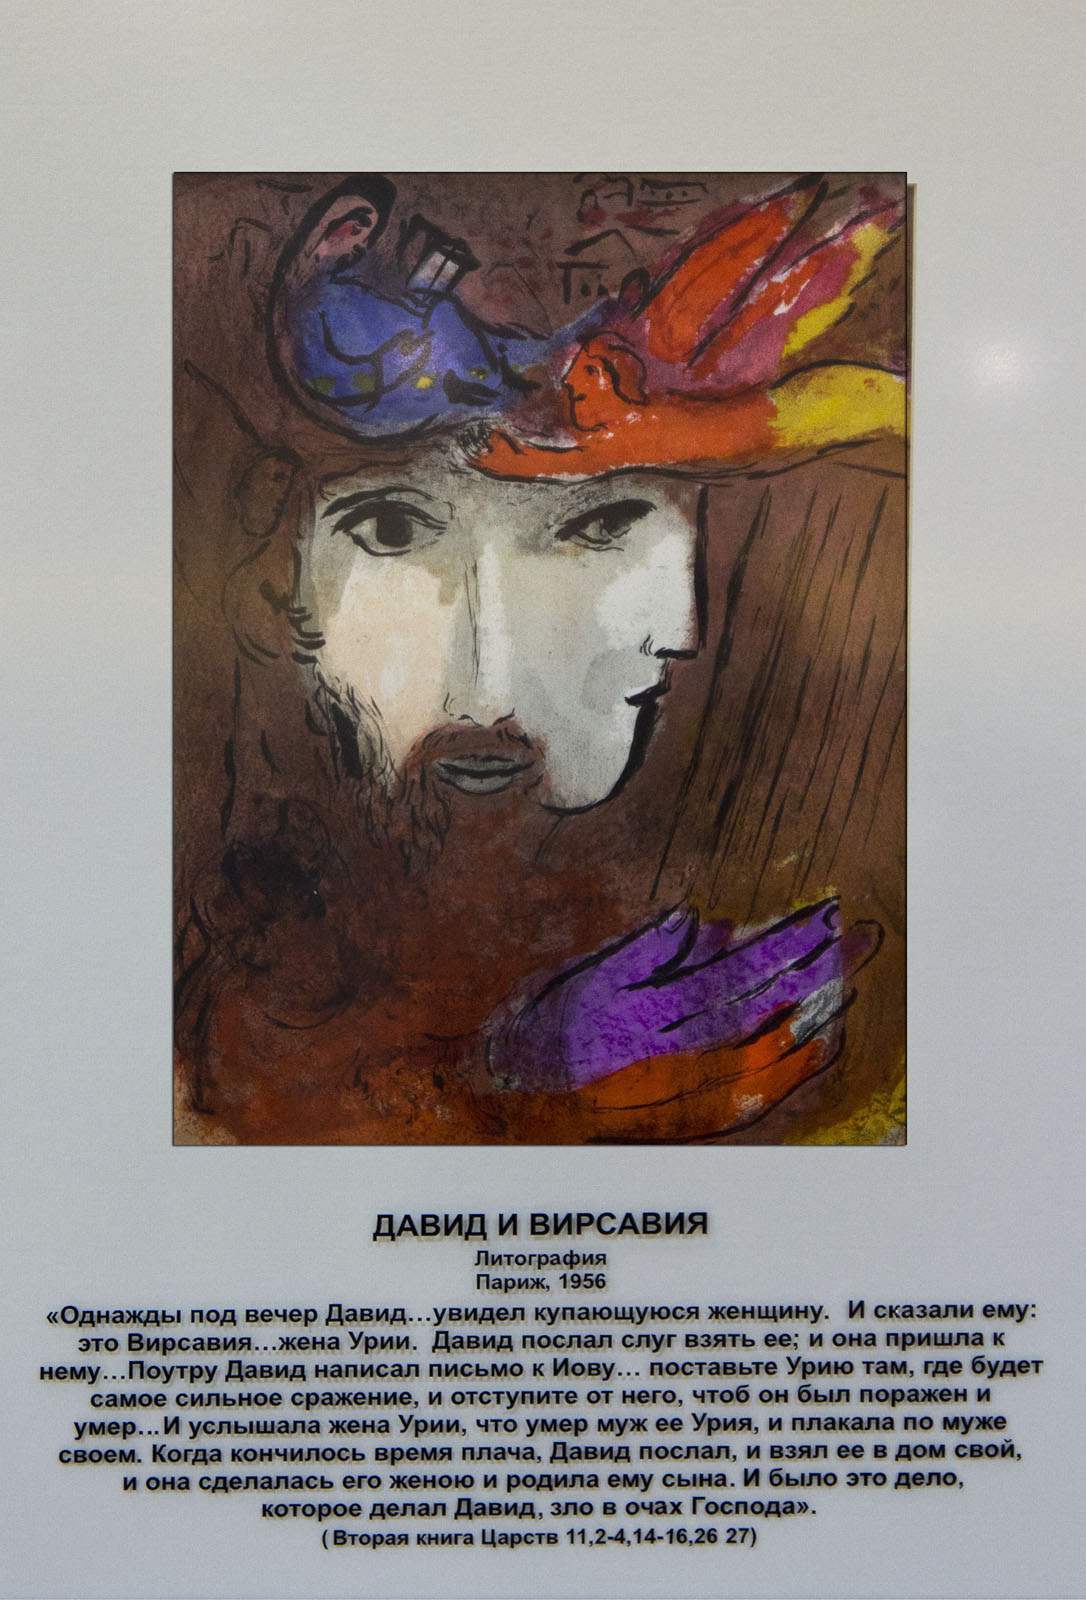 Фото №74426. «Давид и Вирсавия», Марк Шагал, литография, Париж, 1956